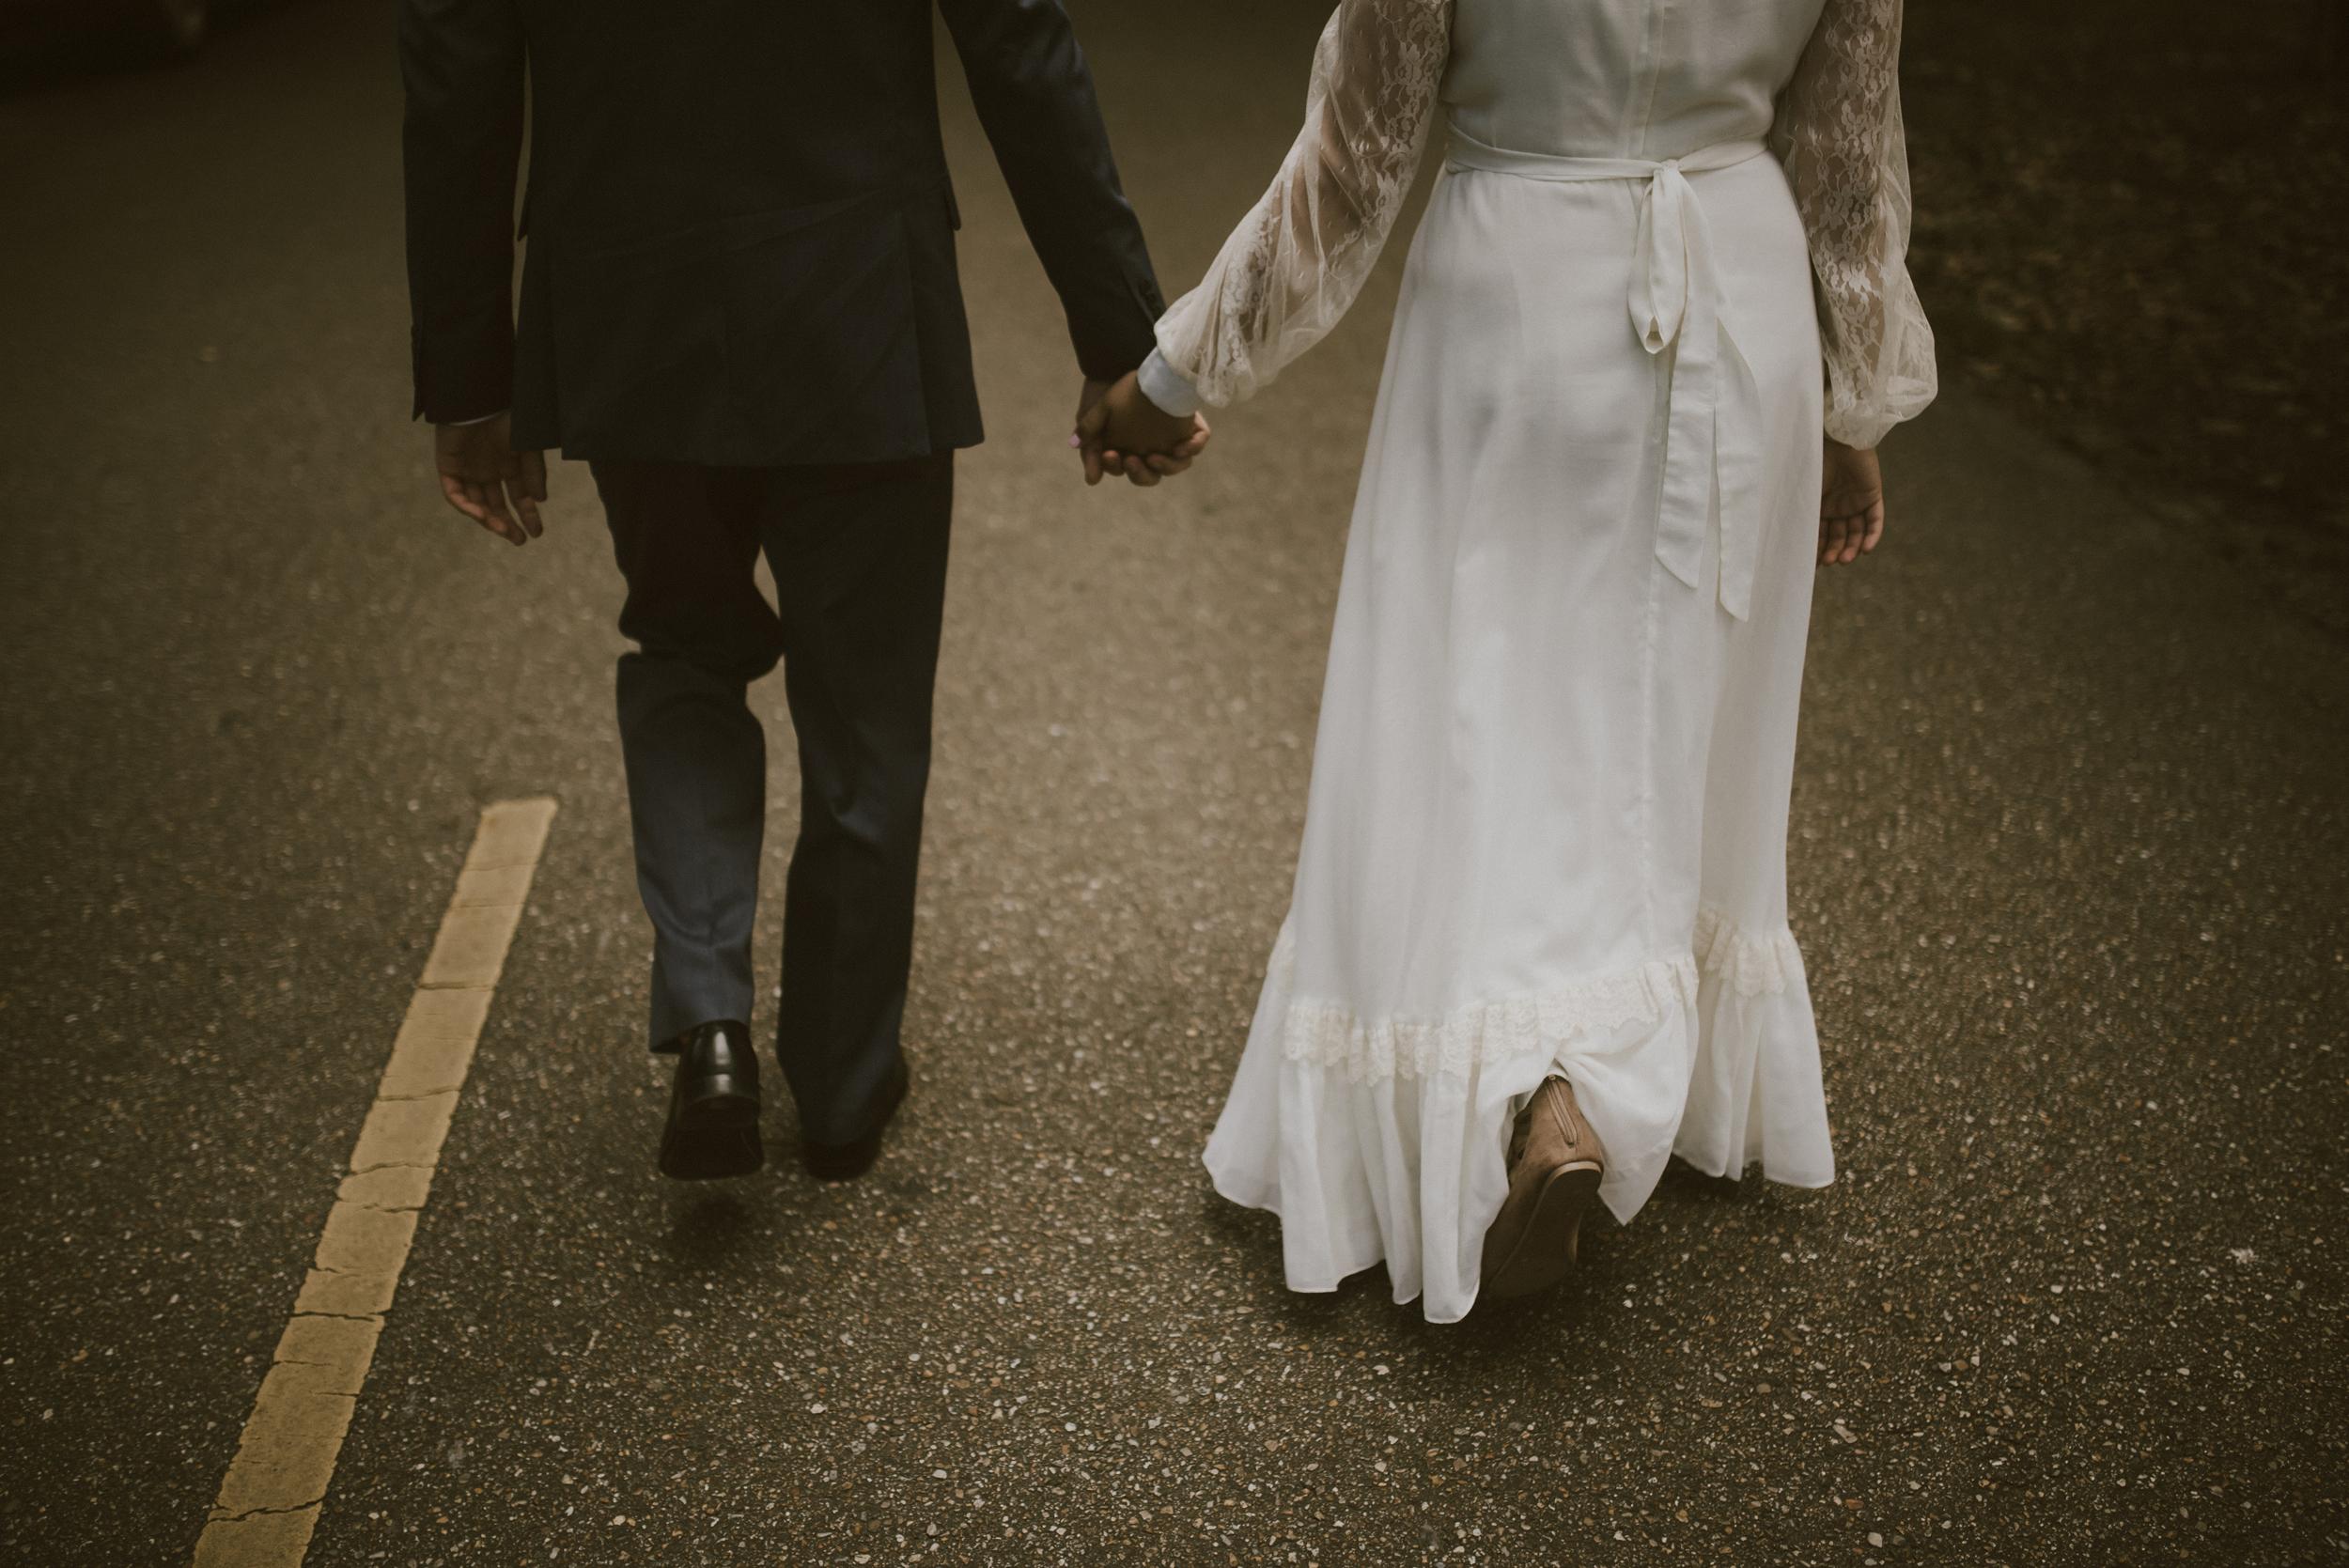 ofRen_weddingphotographer-85.jpg